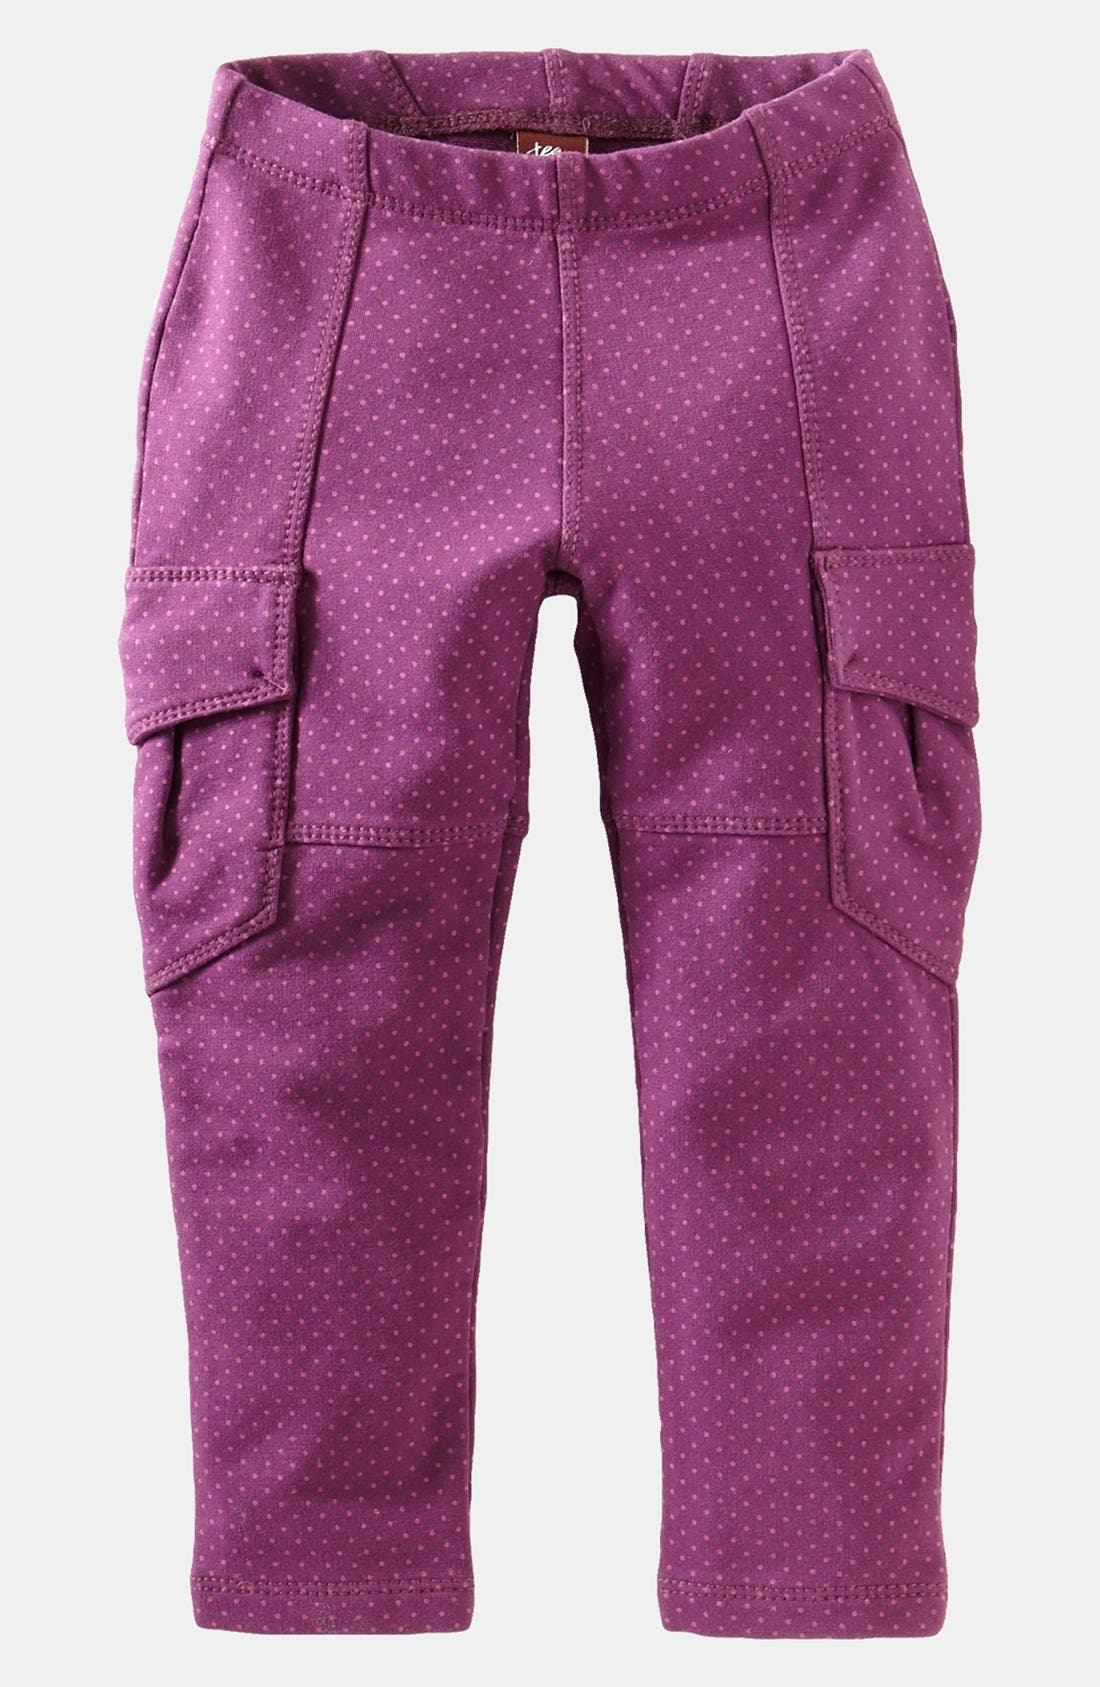 Alternate Image 1 Selected - Tea Collection 'Pin Dot' Cargo Pants (Toddler Girls, Little Girls & Big Girls)